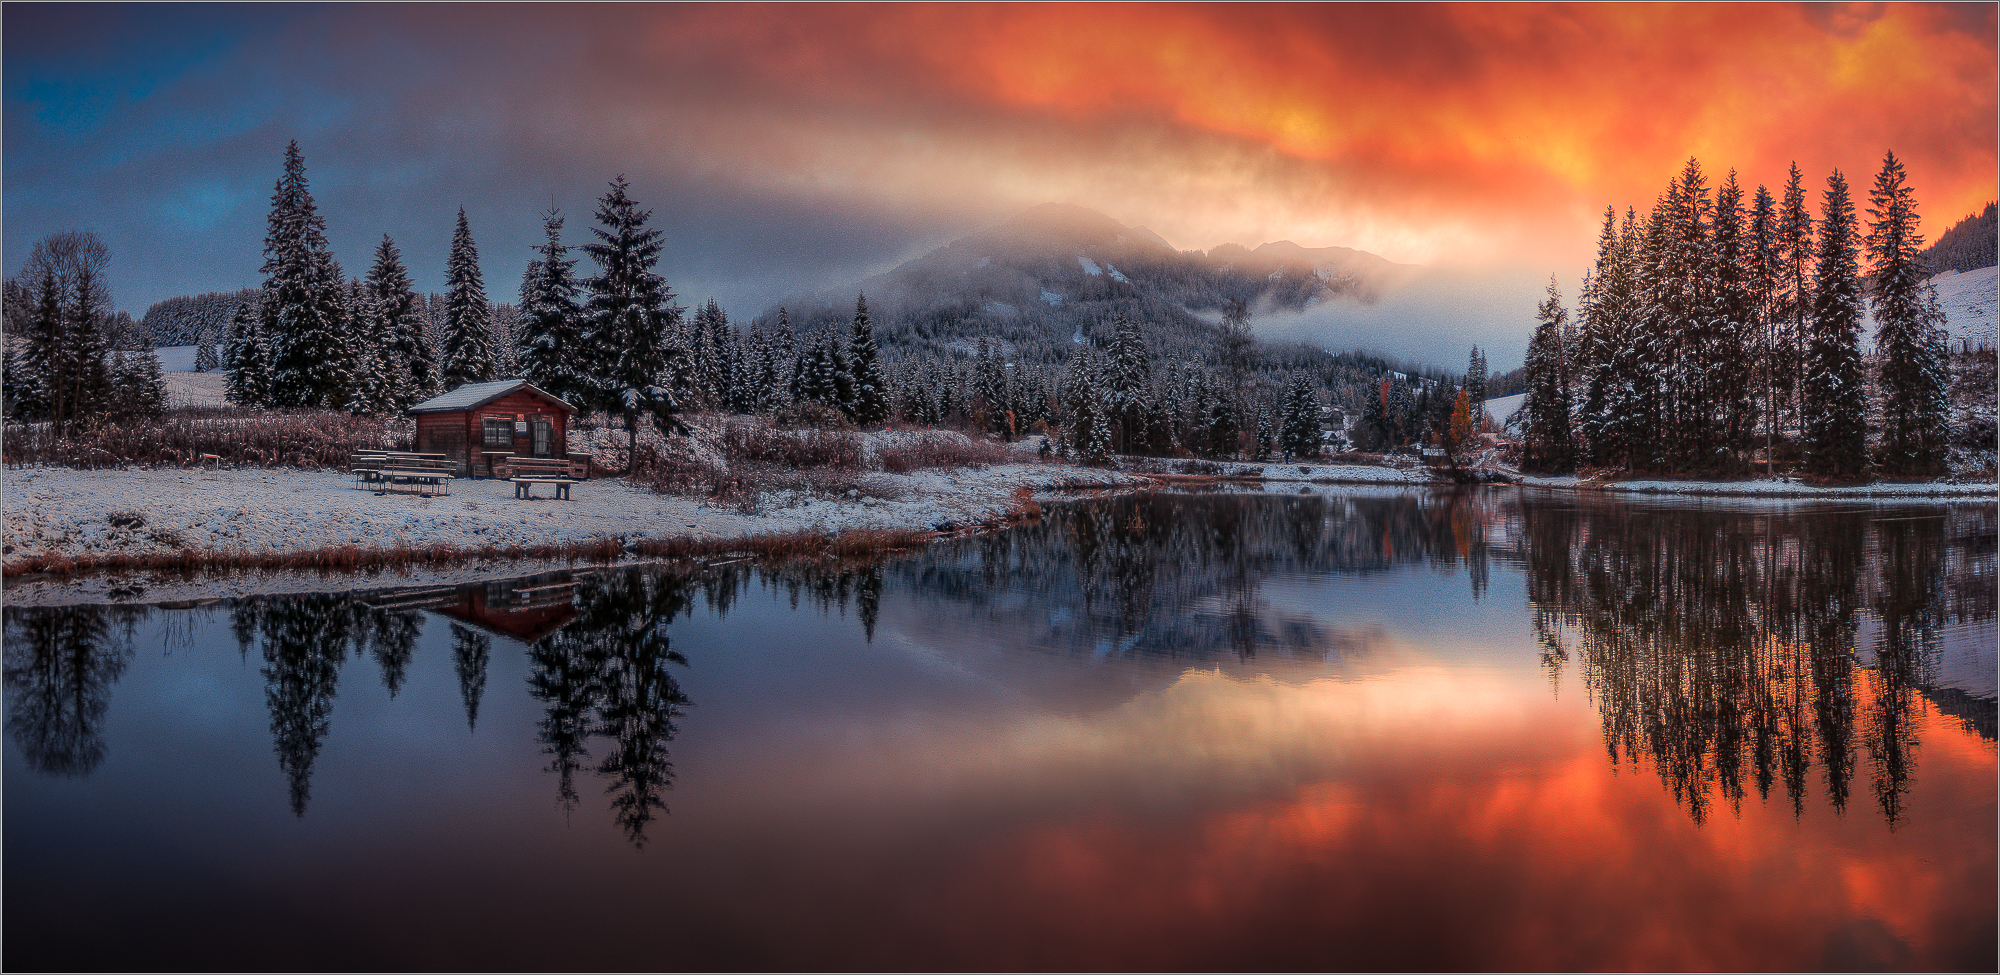 Morgenrot am Teich